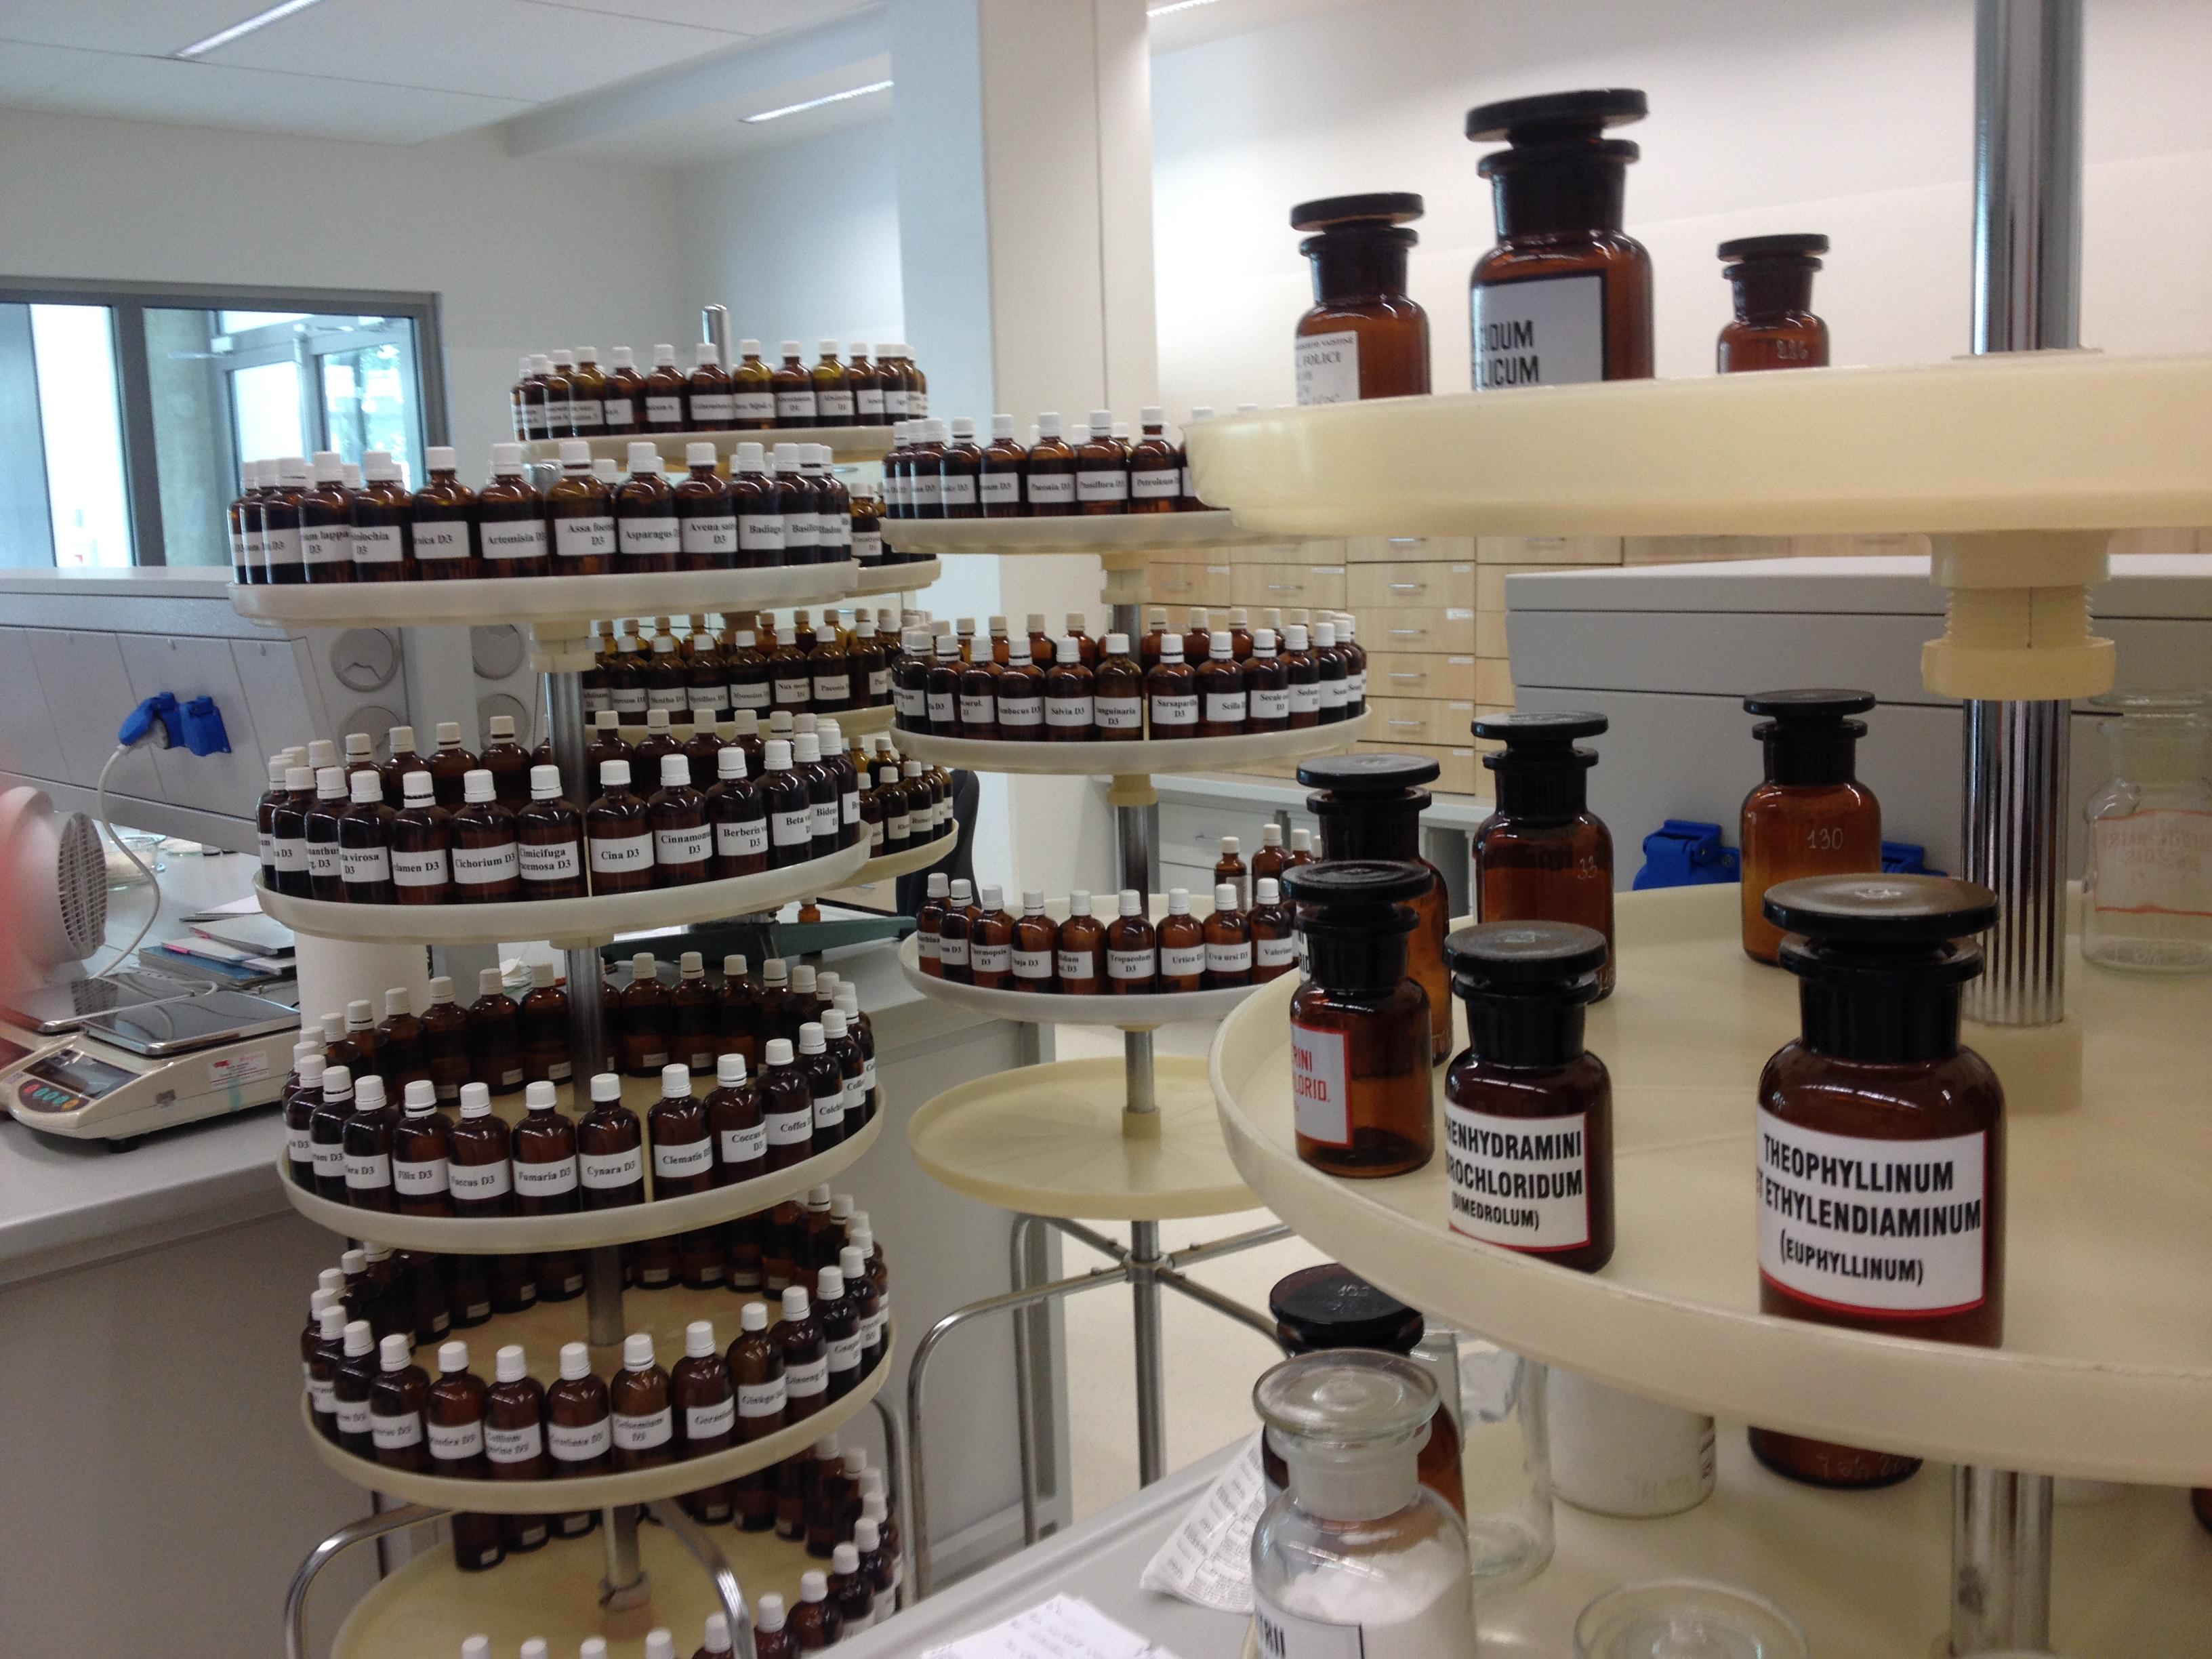 Moins cher 90 mg arcoxia en ligne or acheter arcoxia 120 mg peu couteux en ligne - Commander a manger pas cher ...